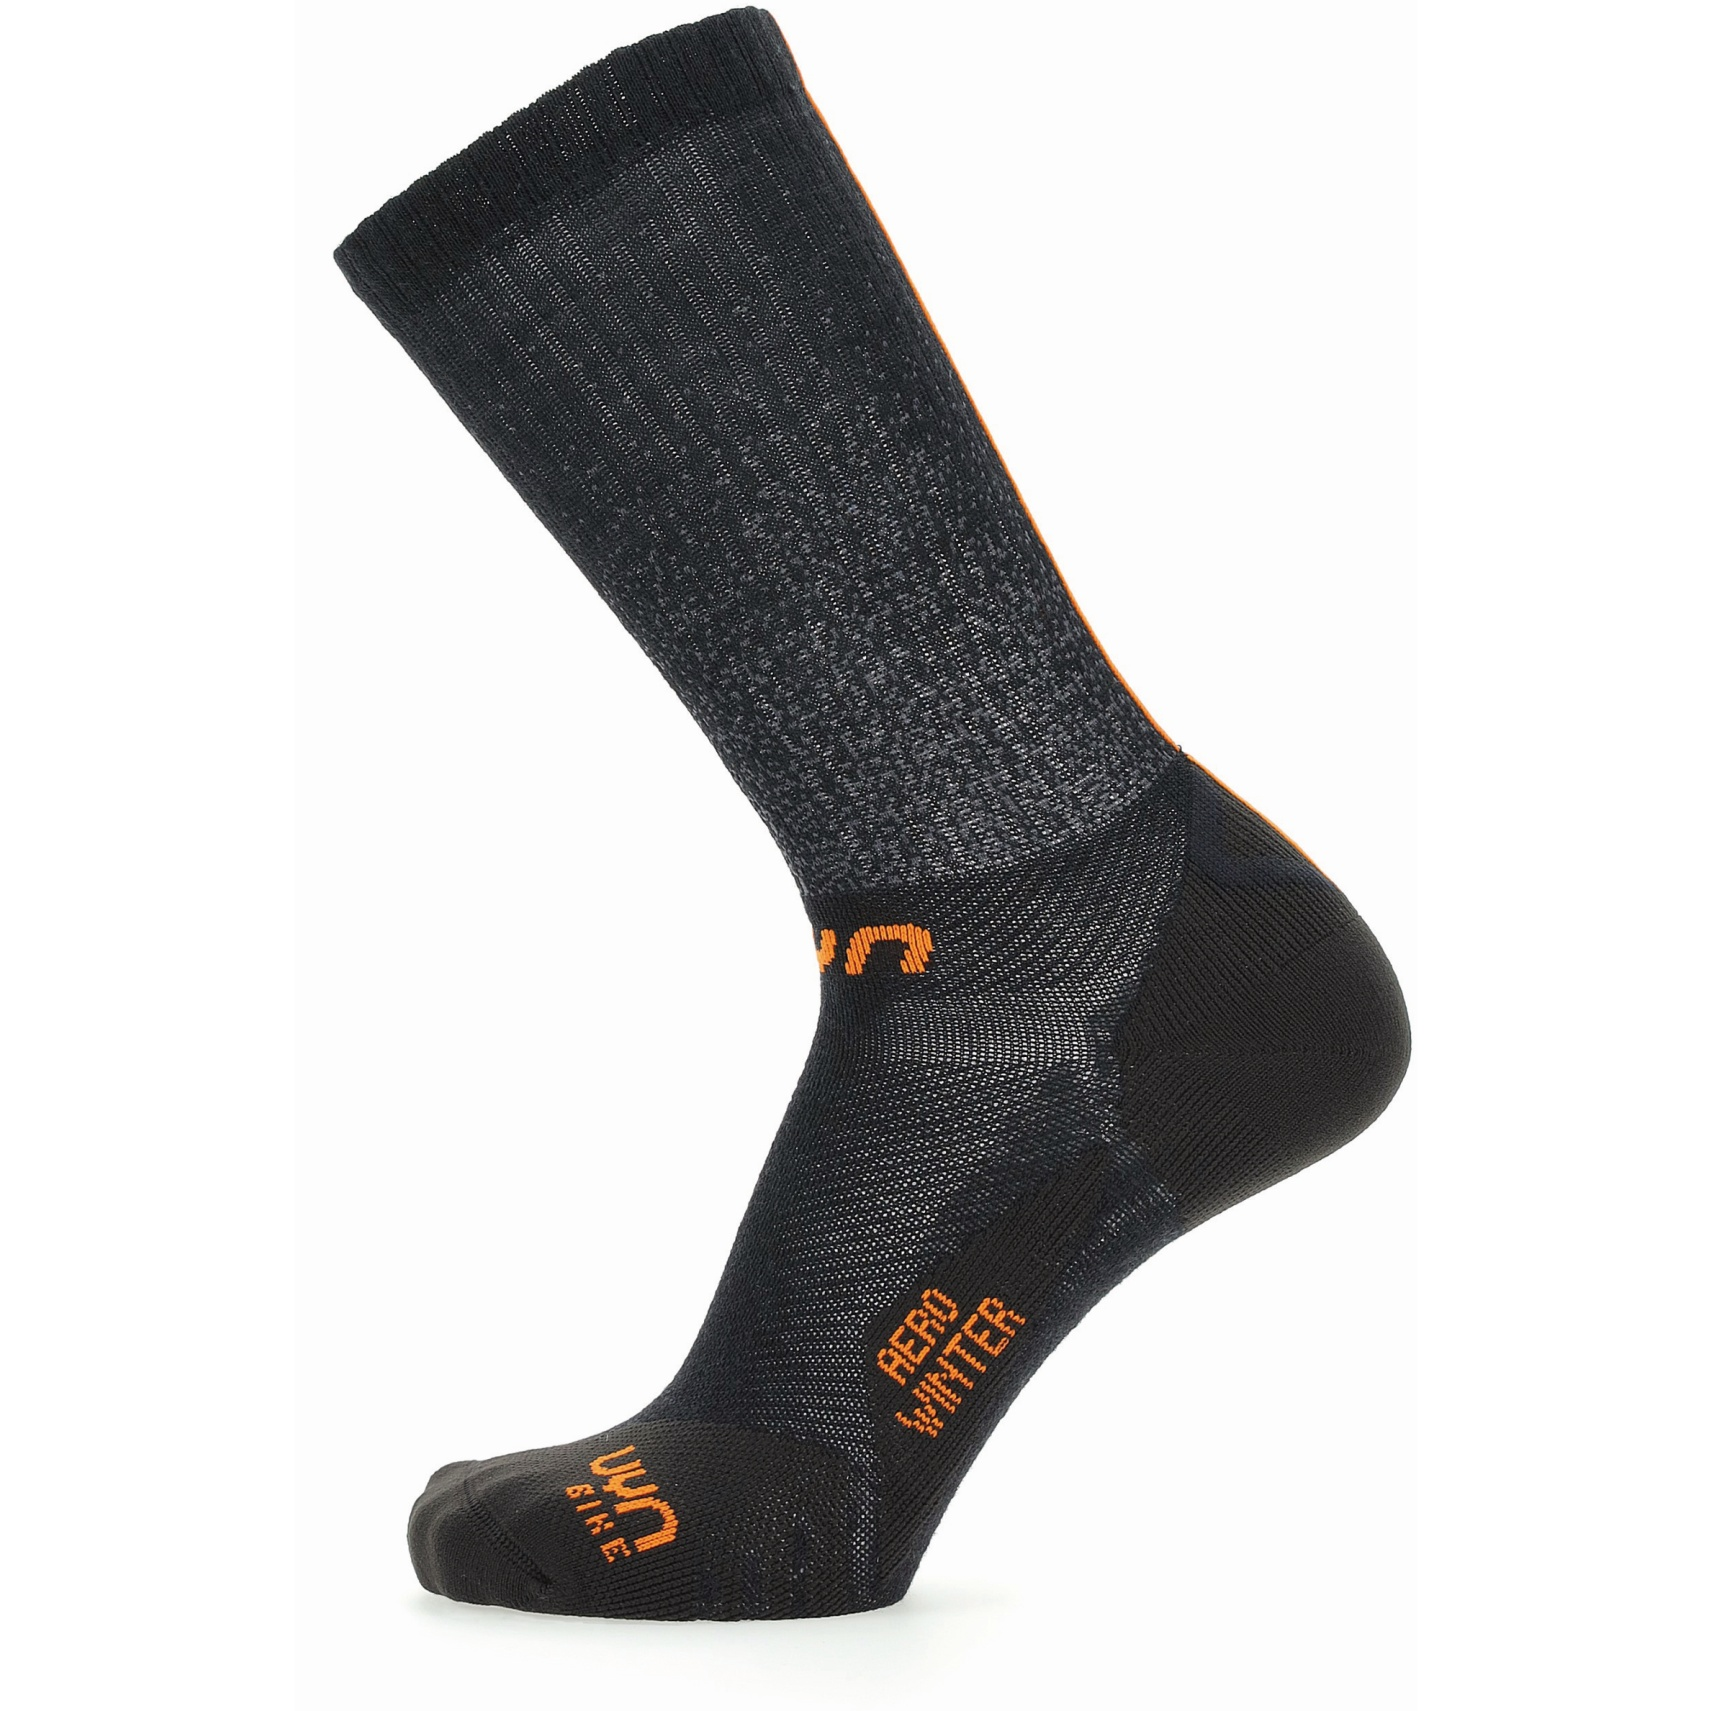 UYN Cycling Aero Winter Socken - Schwarz/Orange